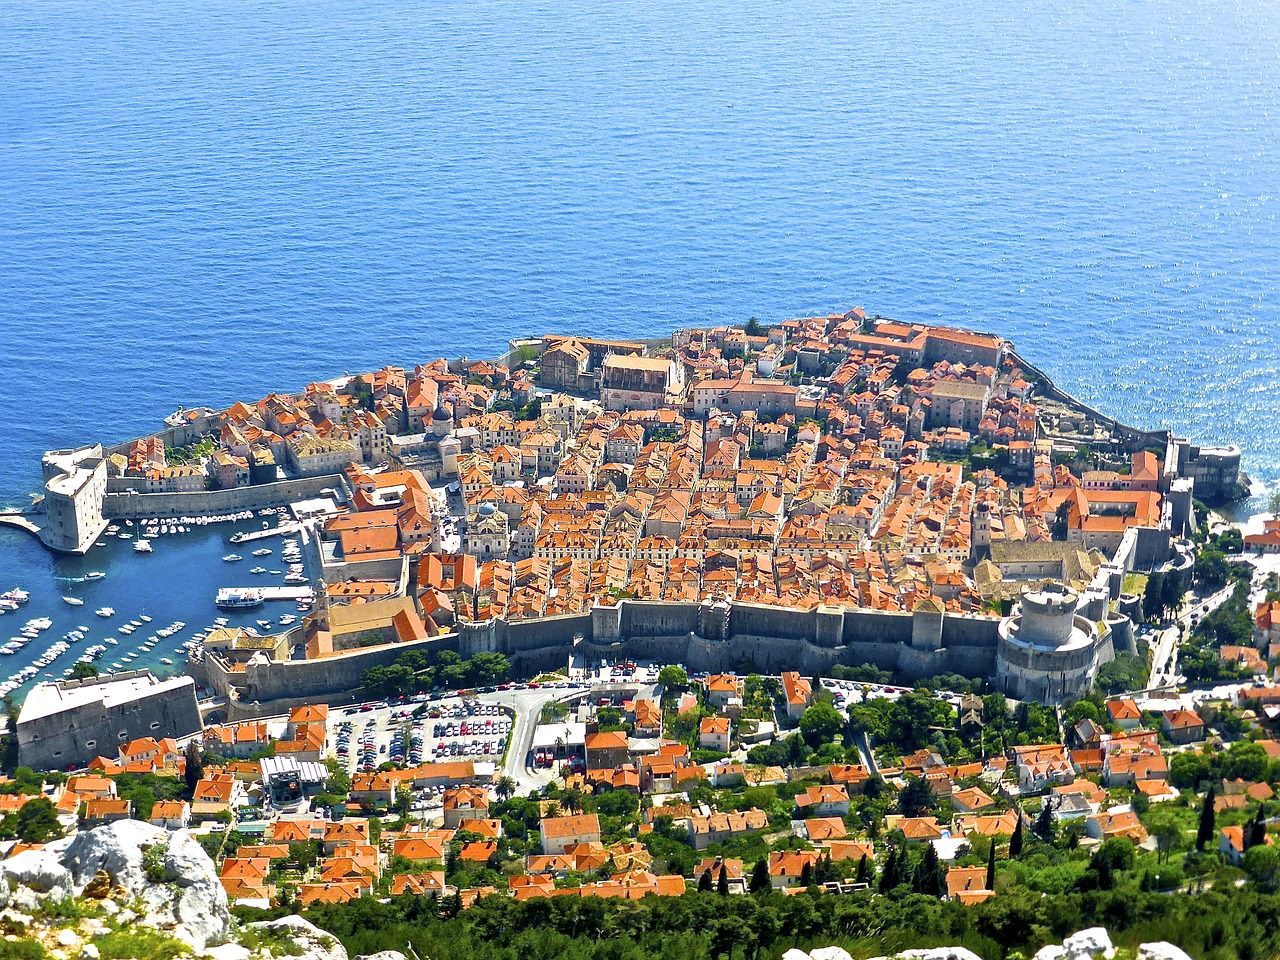 Dubrovnik-Vrgorac